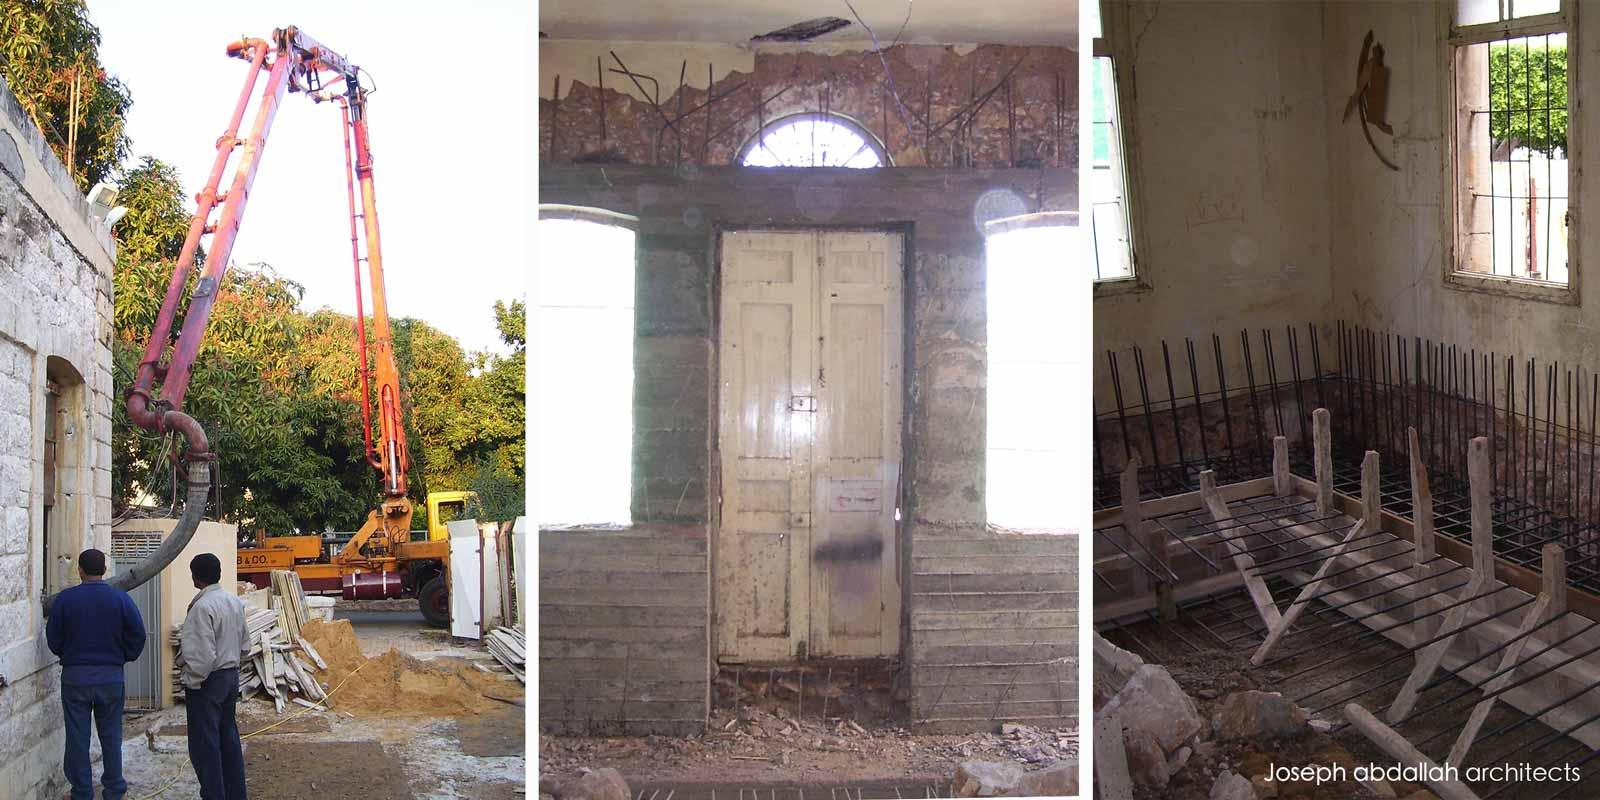 bank-lcb-sgbl-apotres-restoration-architecture-joseph-abdallah-architects-3